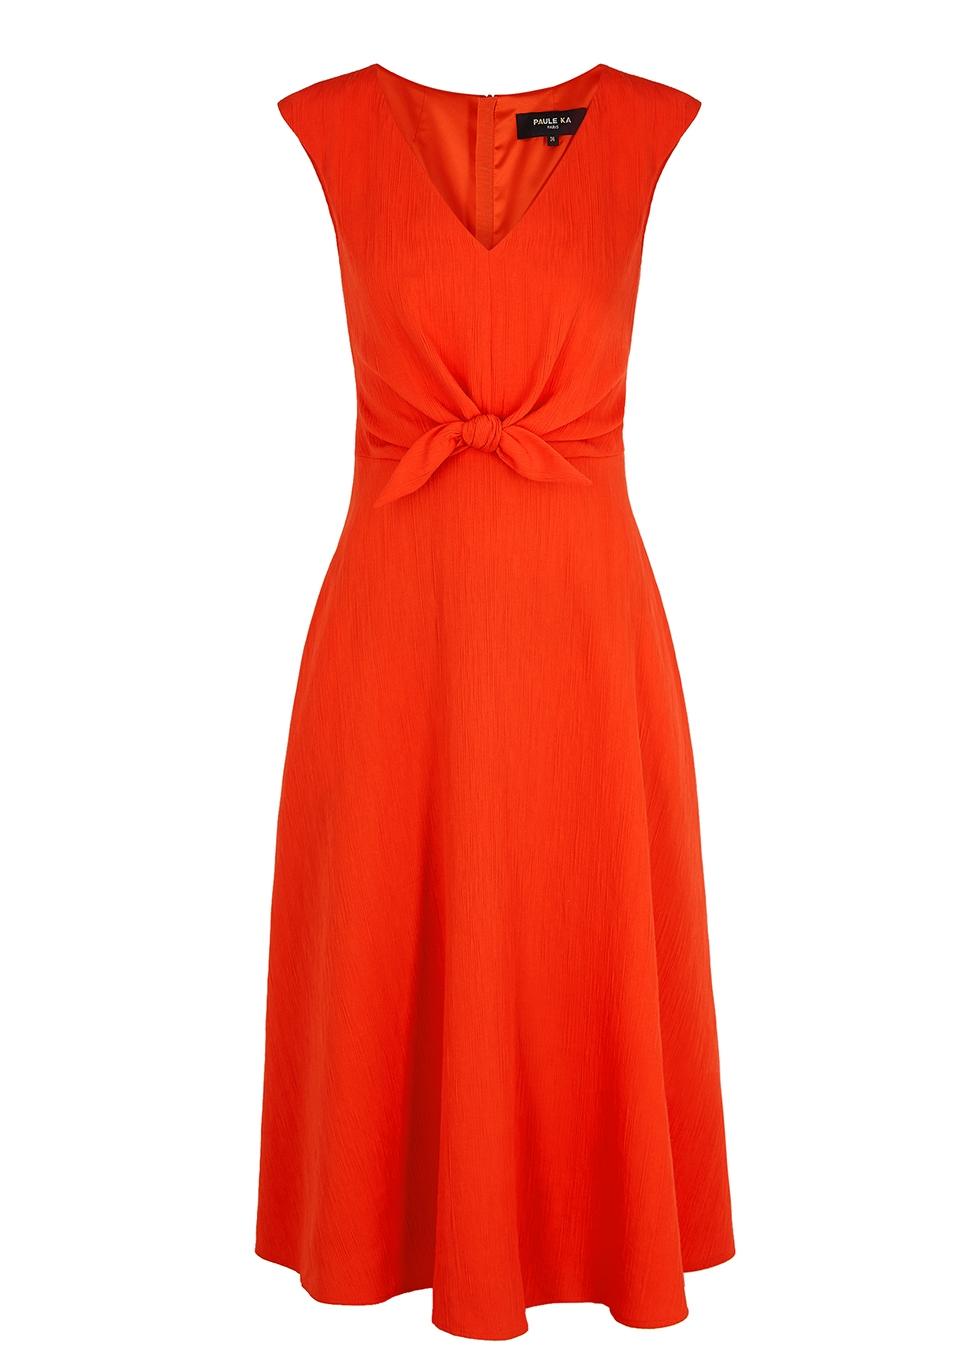 Coral bow-embellished midi dress